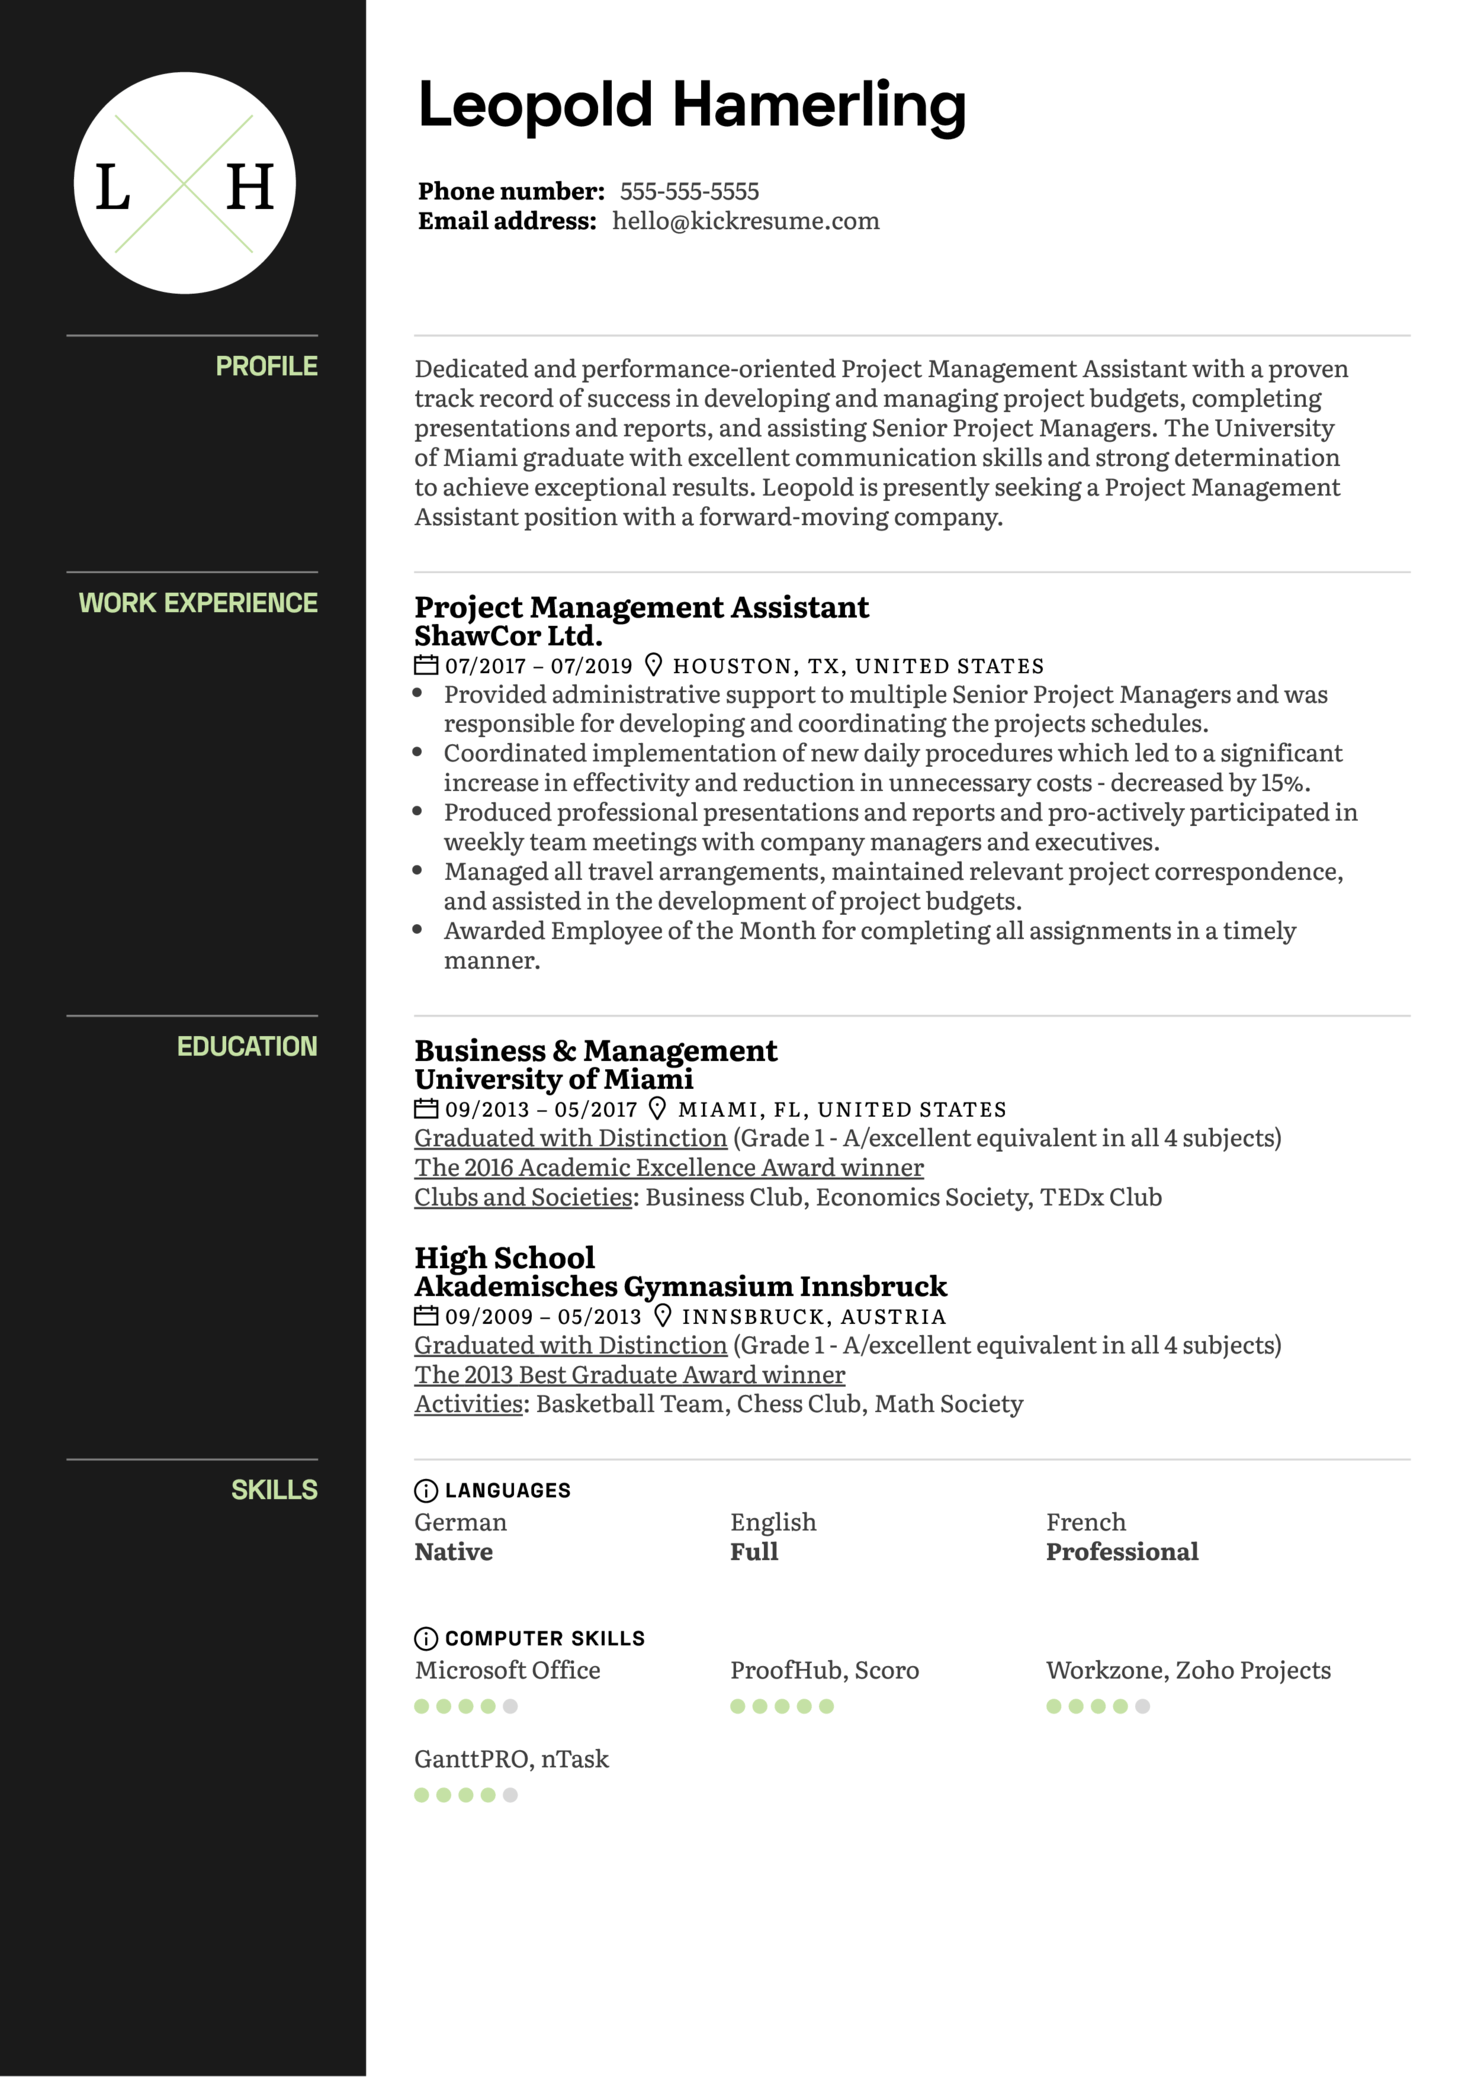 Project Management Assistant Resume Sample (Part 1)